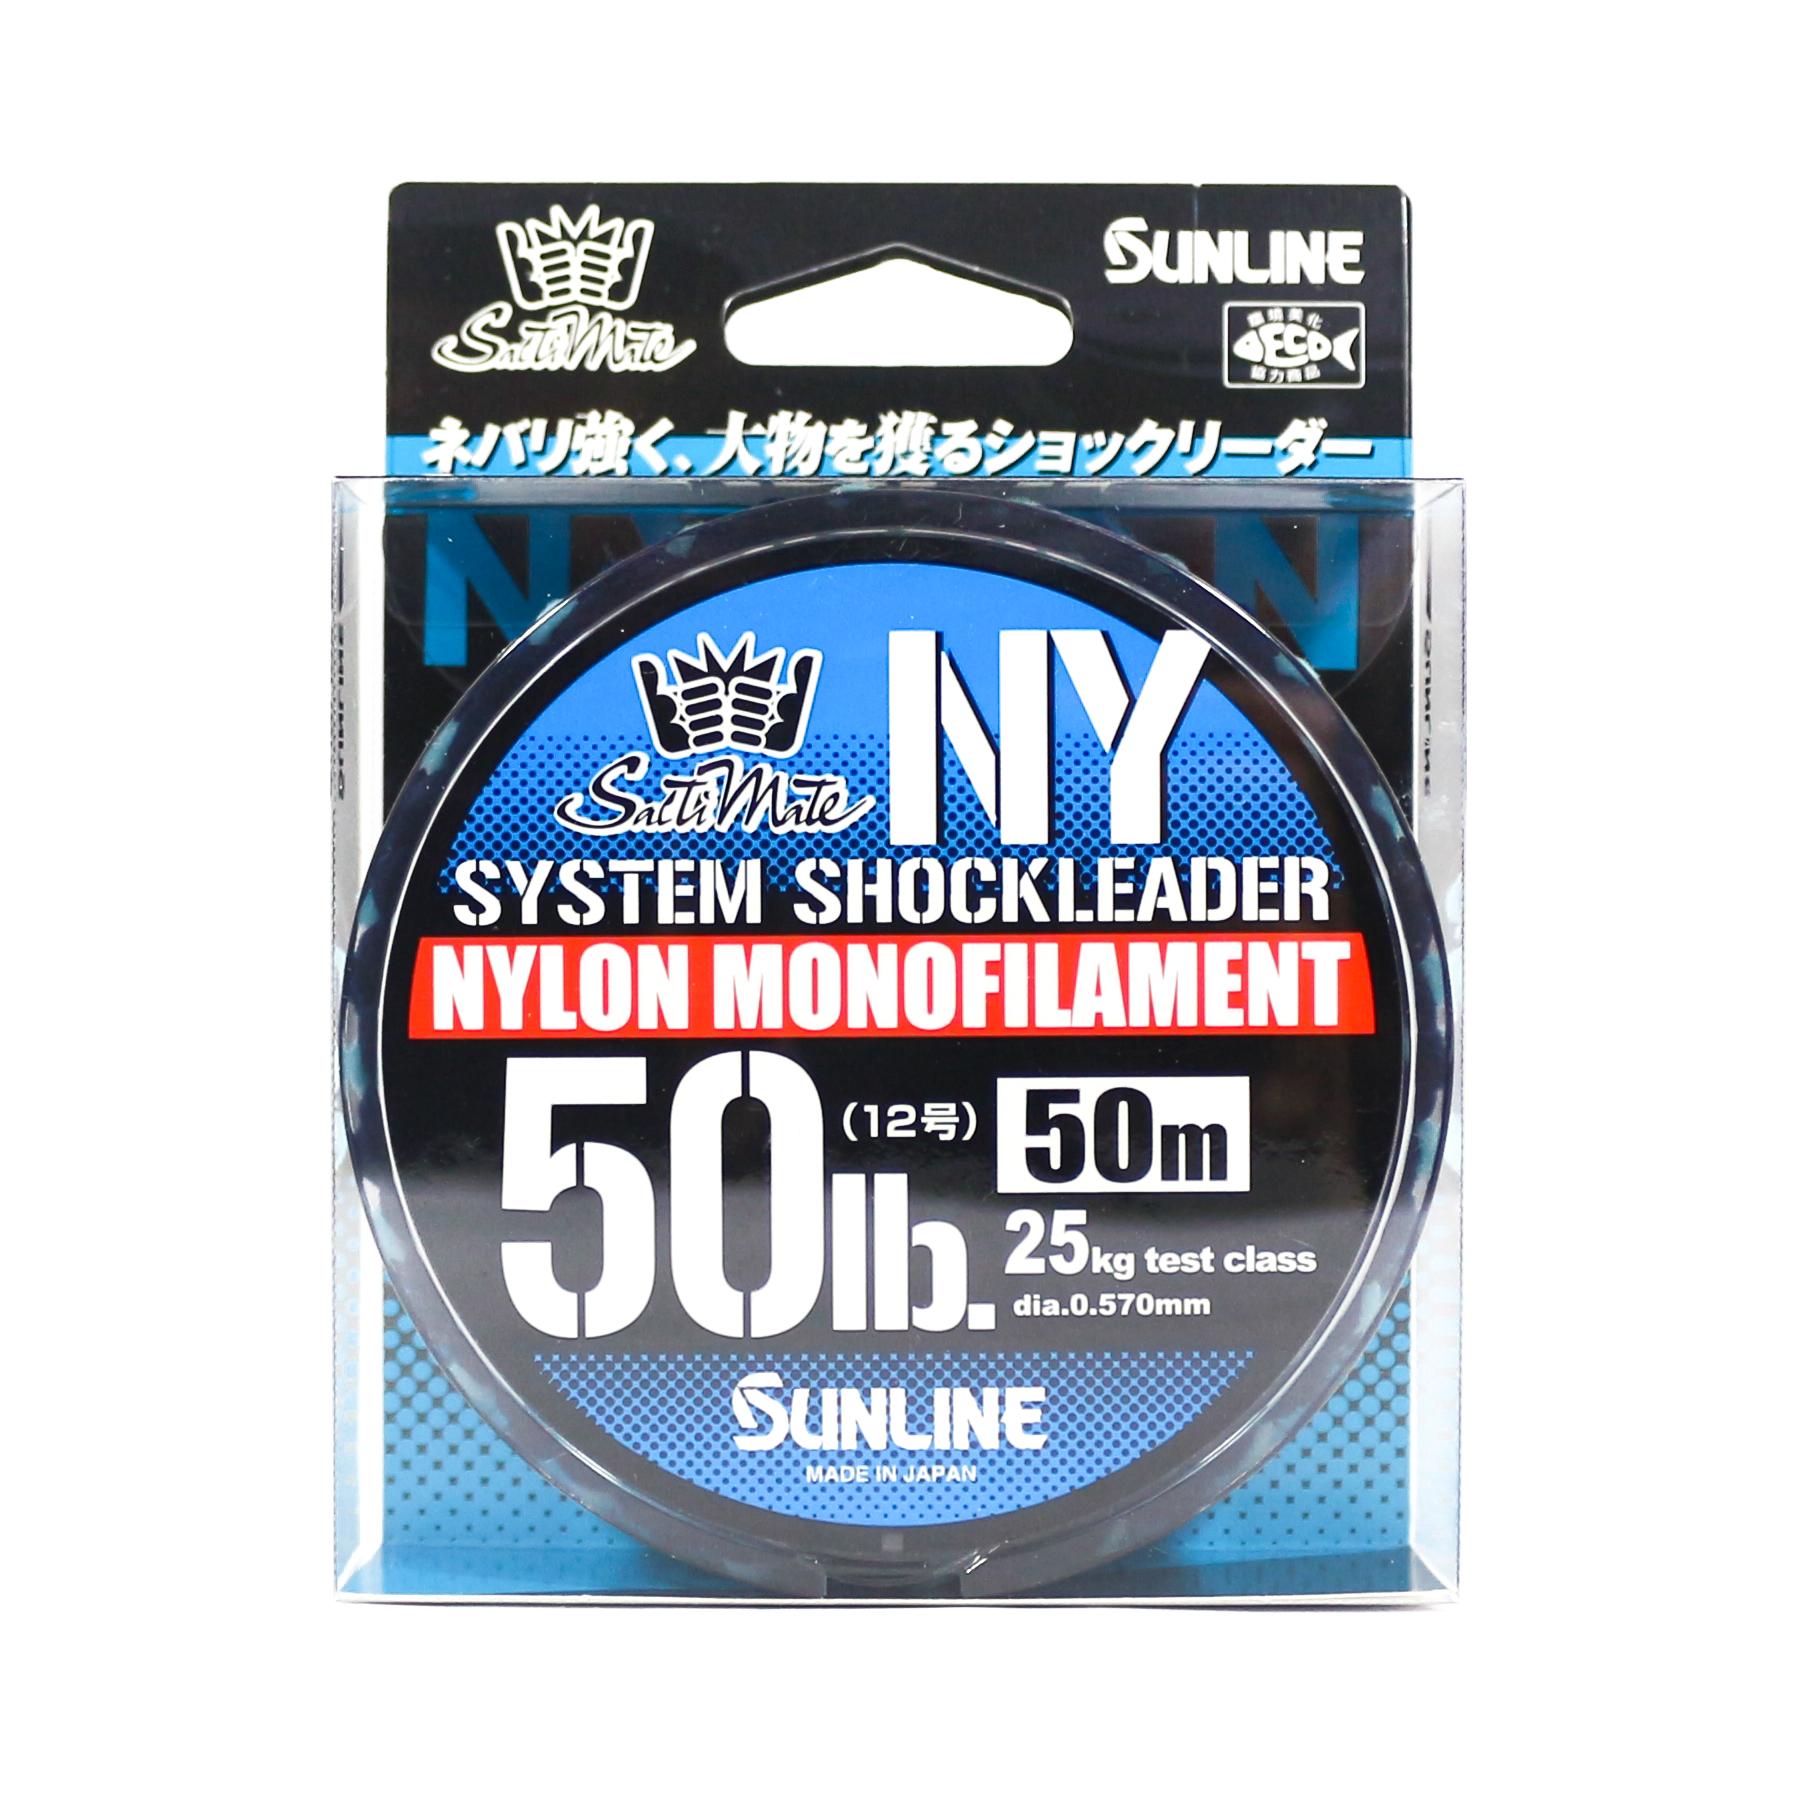 Sunline NY System Shock Leader Nylon 50m 50lb (9338)